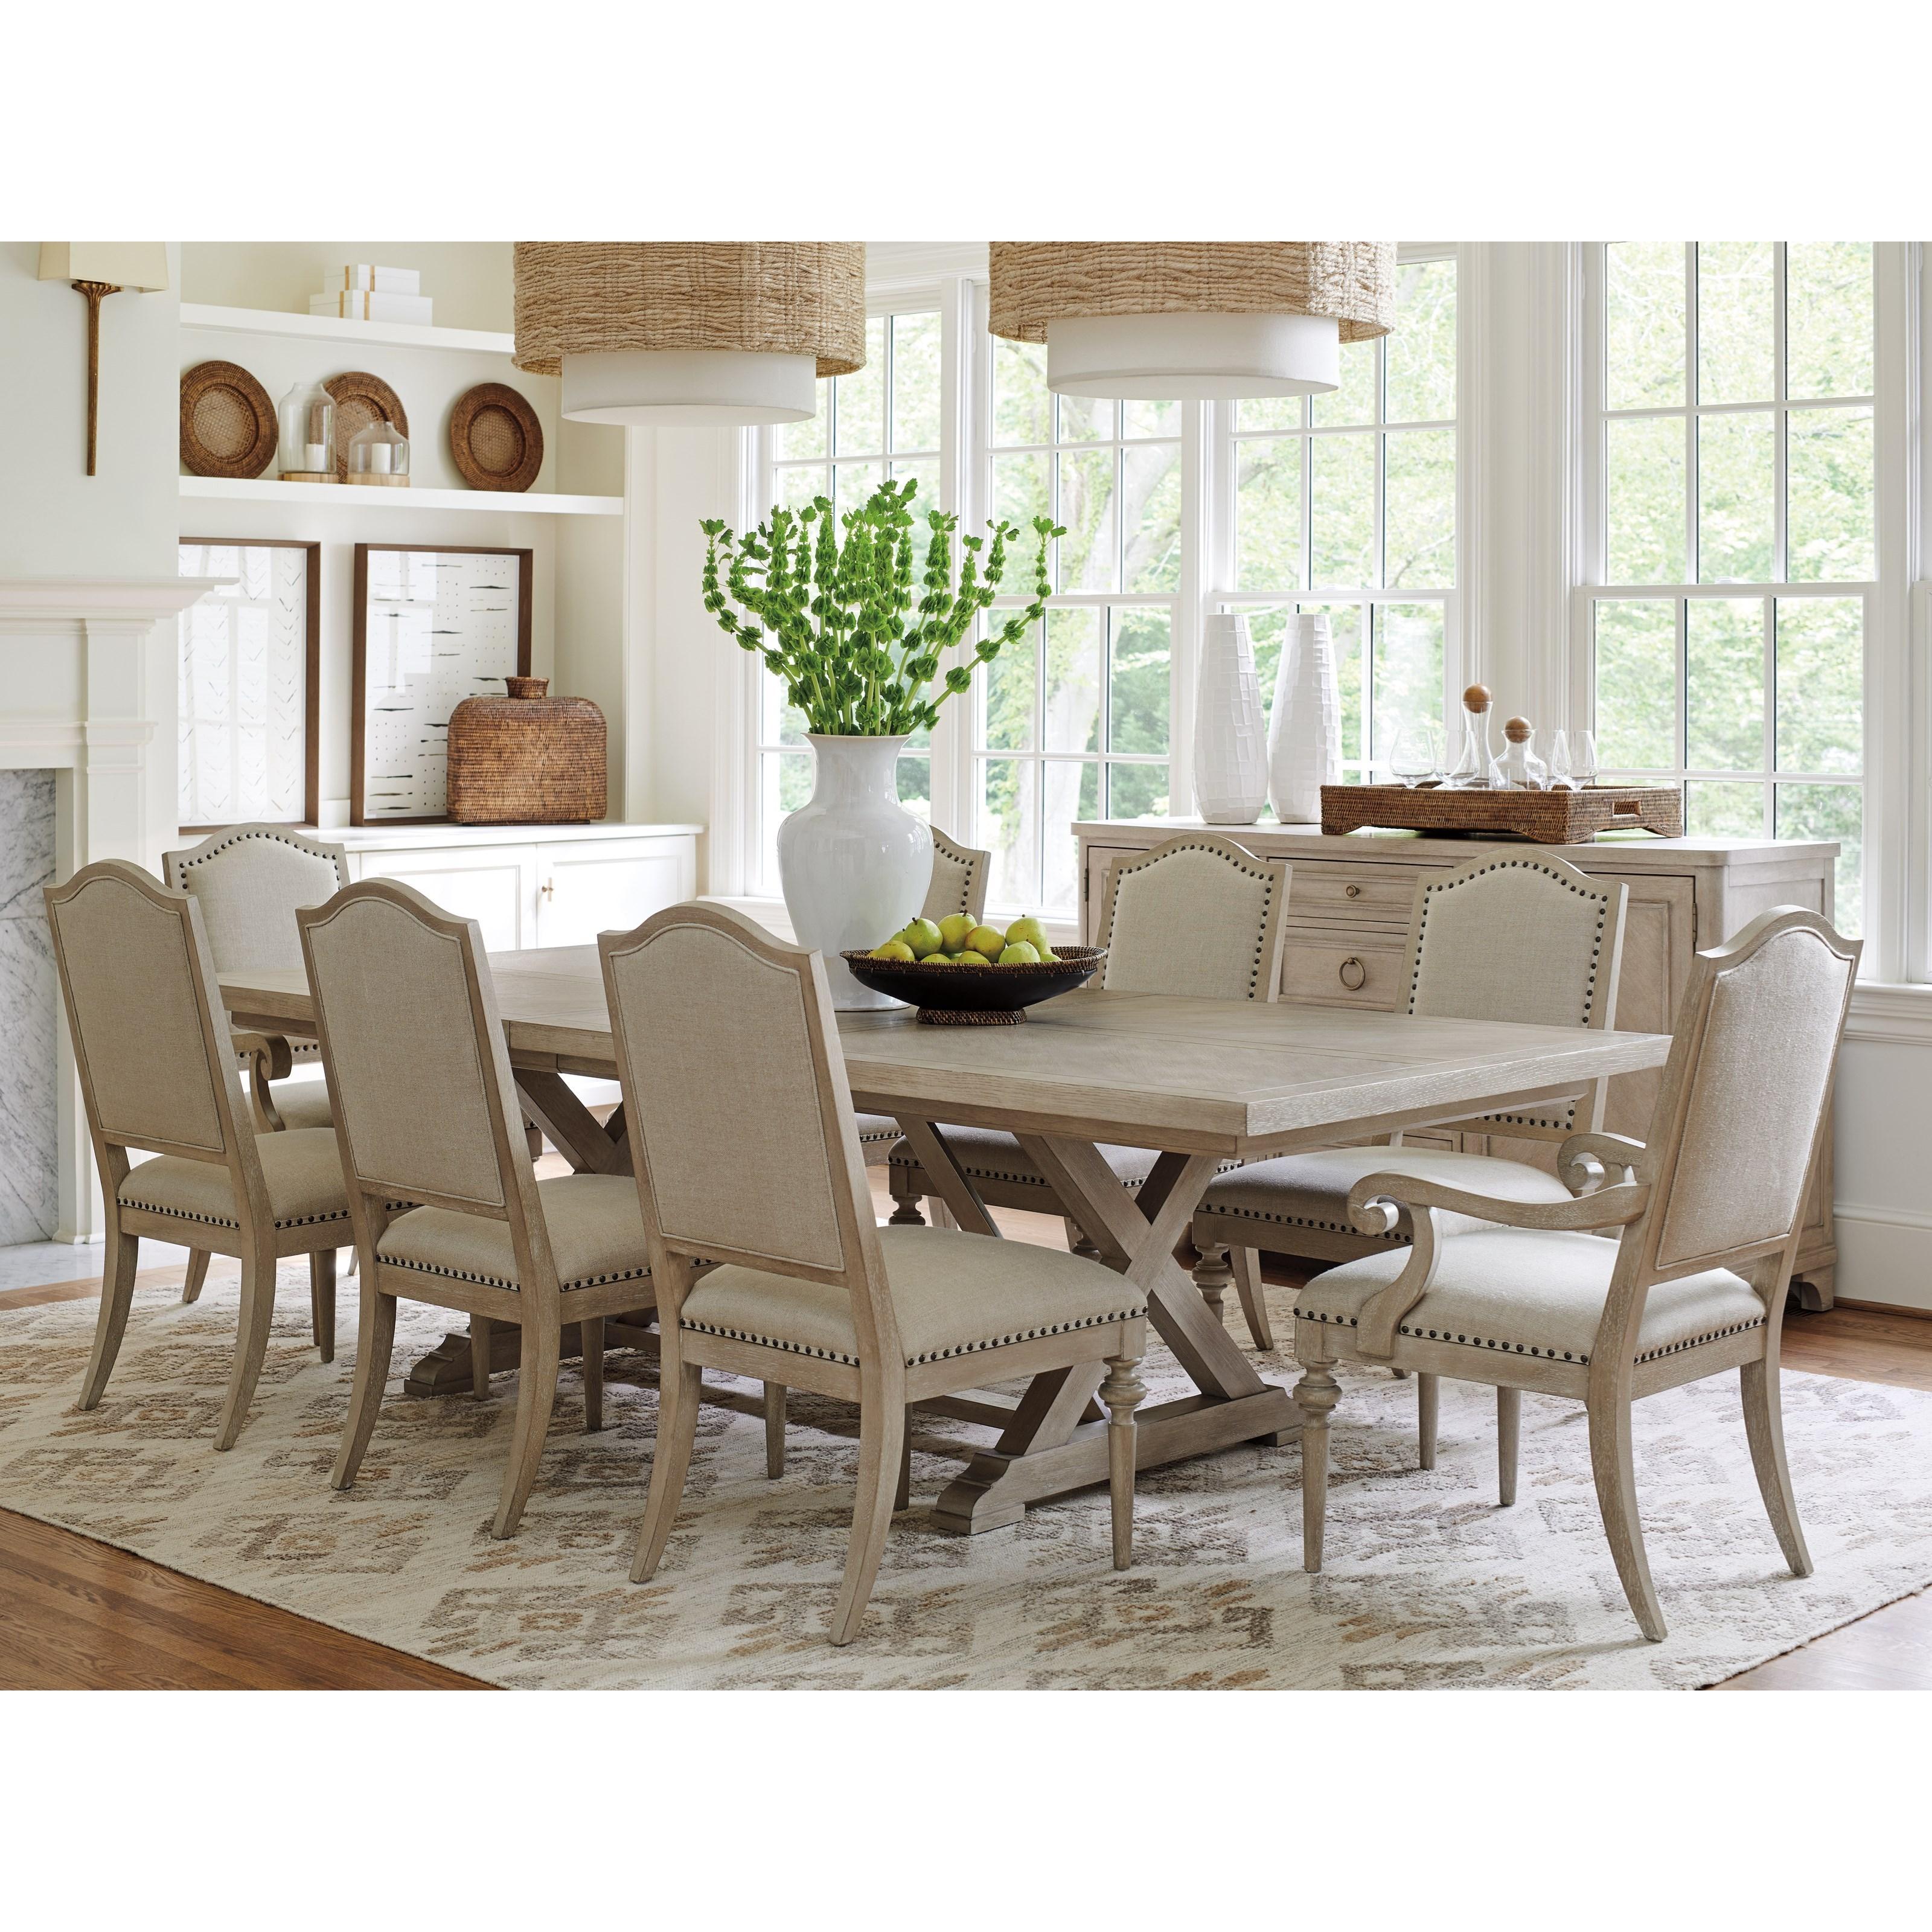 Malibu Formal Dining Group by Barclay Butera at Baer's Furniture